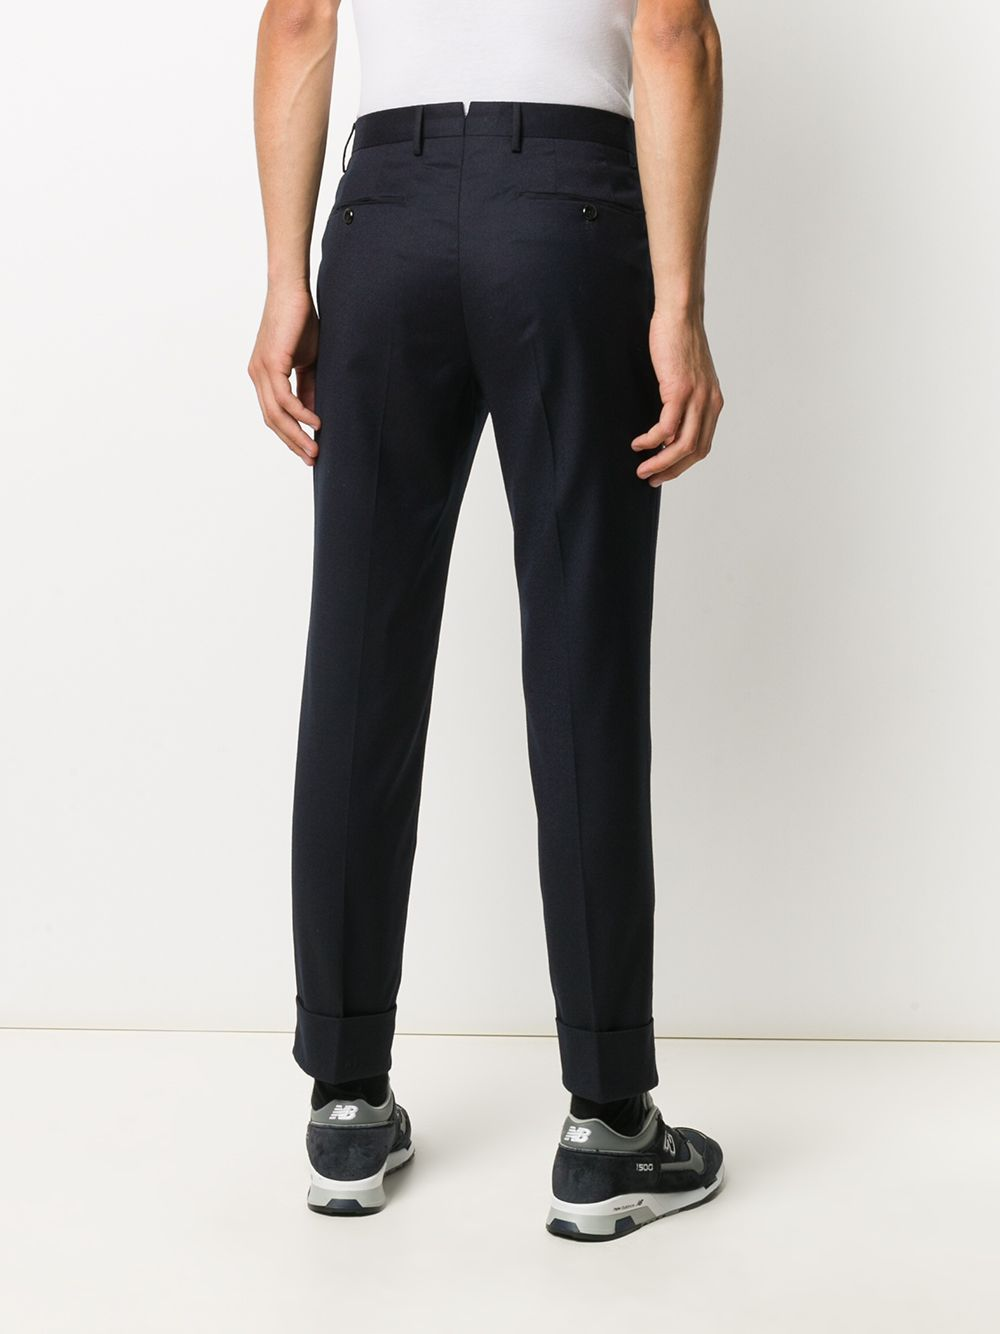 Pantaloni blu navy in misto lana vergine con pieghe PT01 | Pantaloni | COAFFKZ00CL1-CM130360